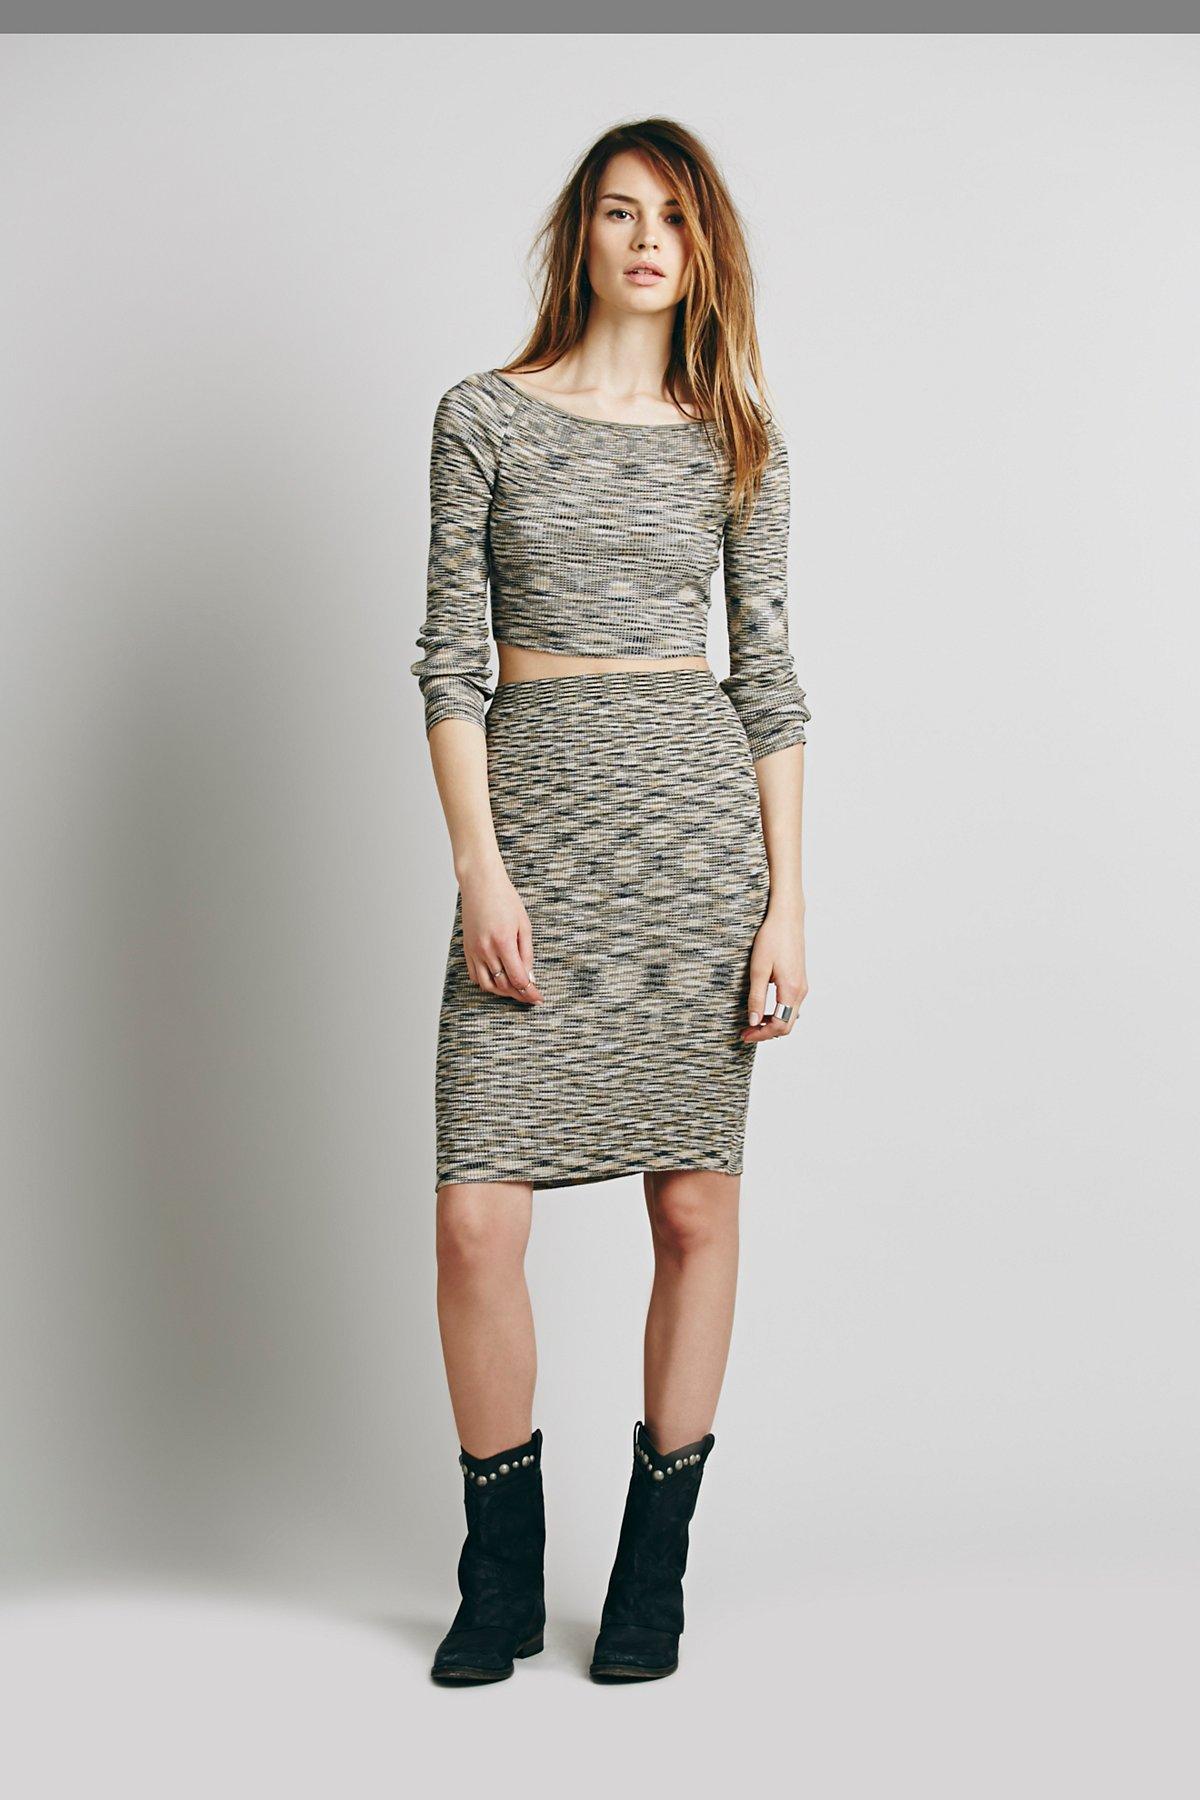 Mutual Feeling Space Dye Sweater Set